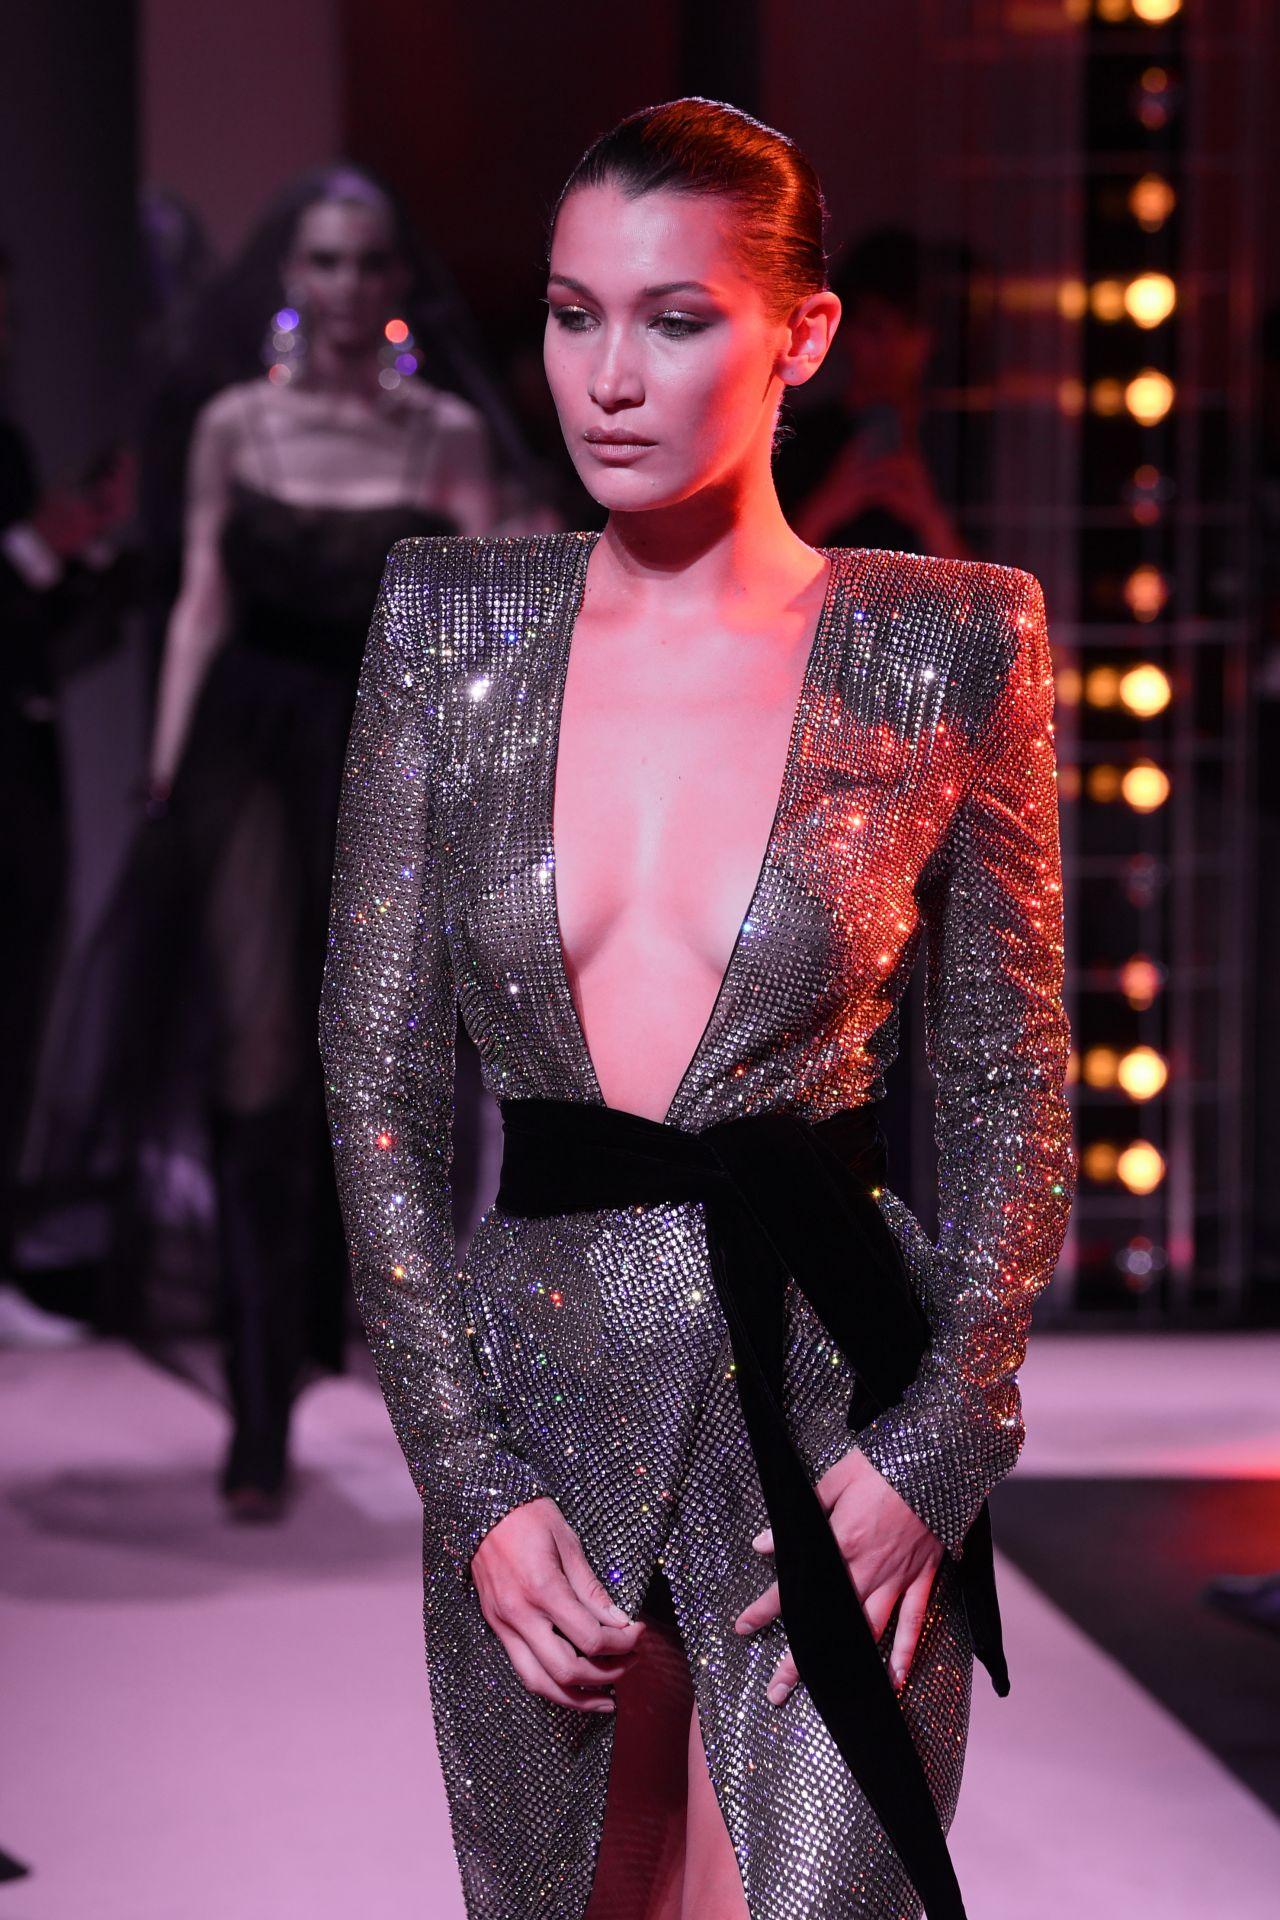 Bella Hadid At Ralph Lauren Runway Show At New York: Alexandre Vauthier Show In Paris